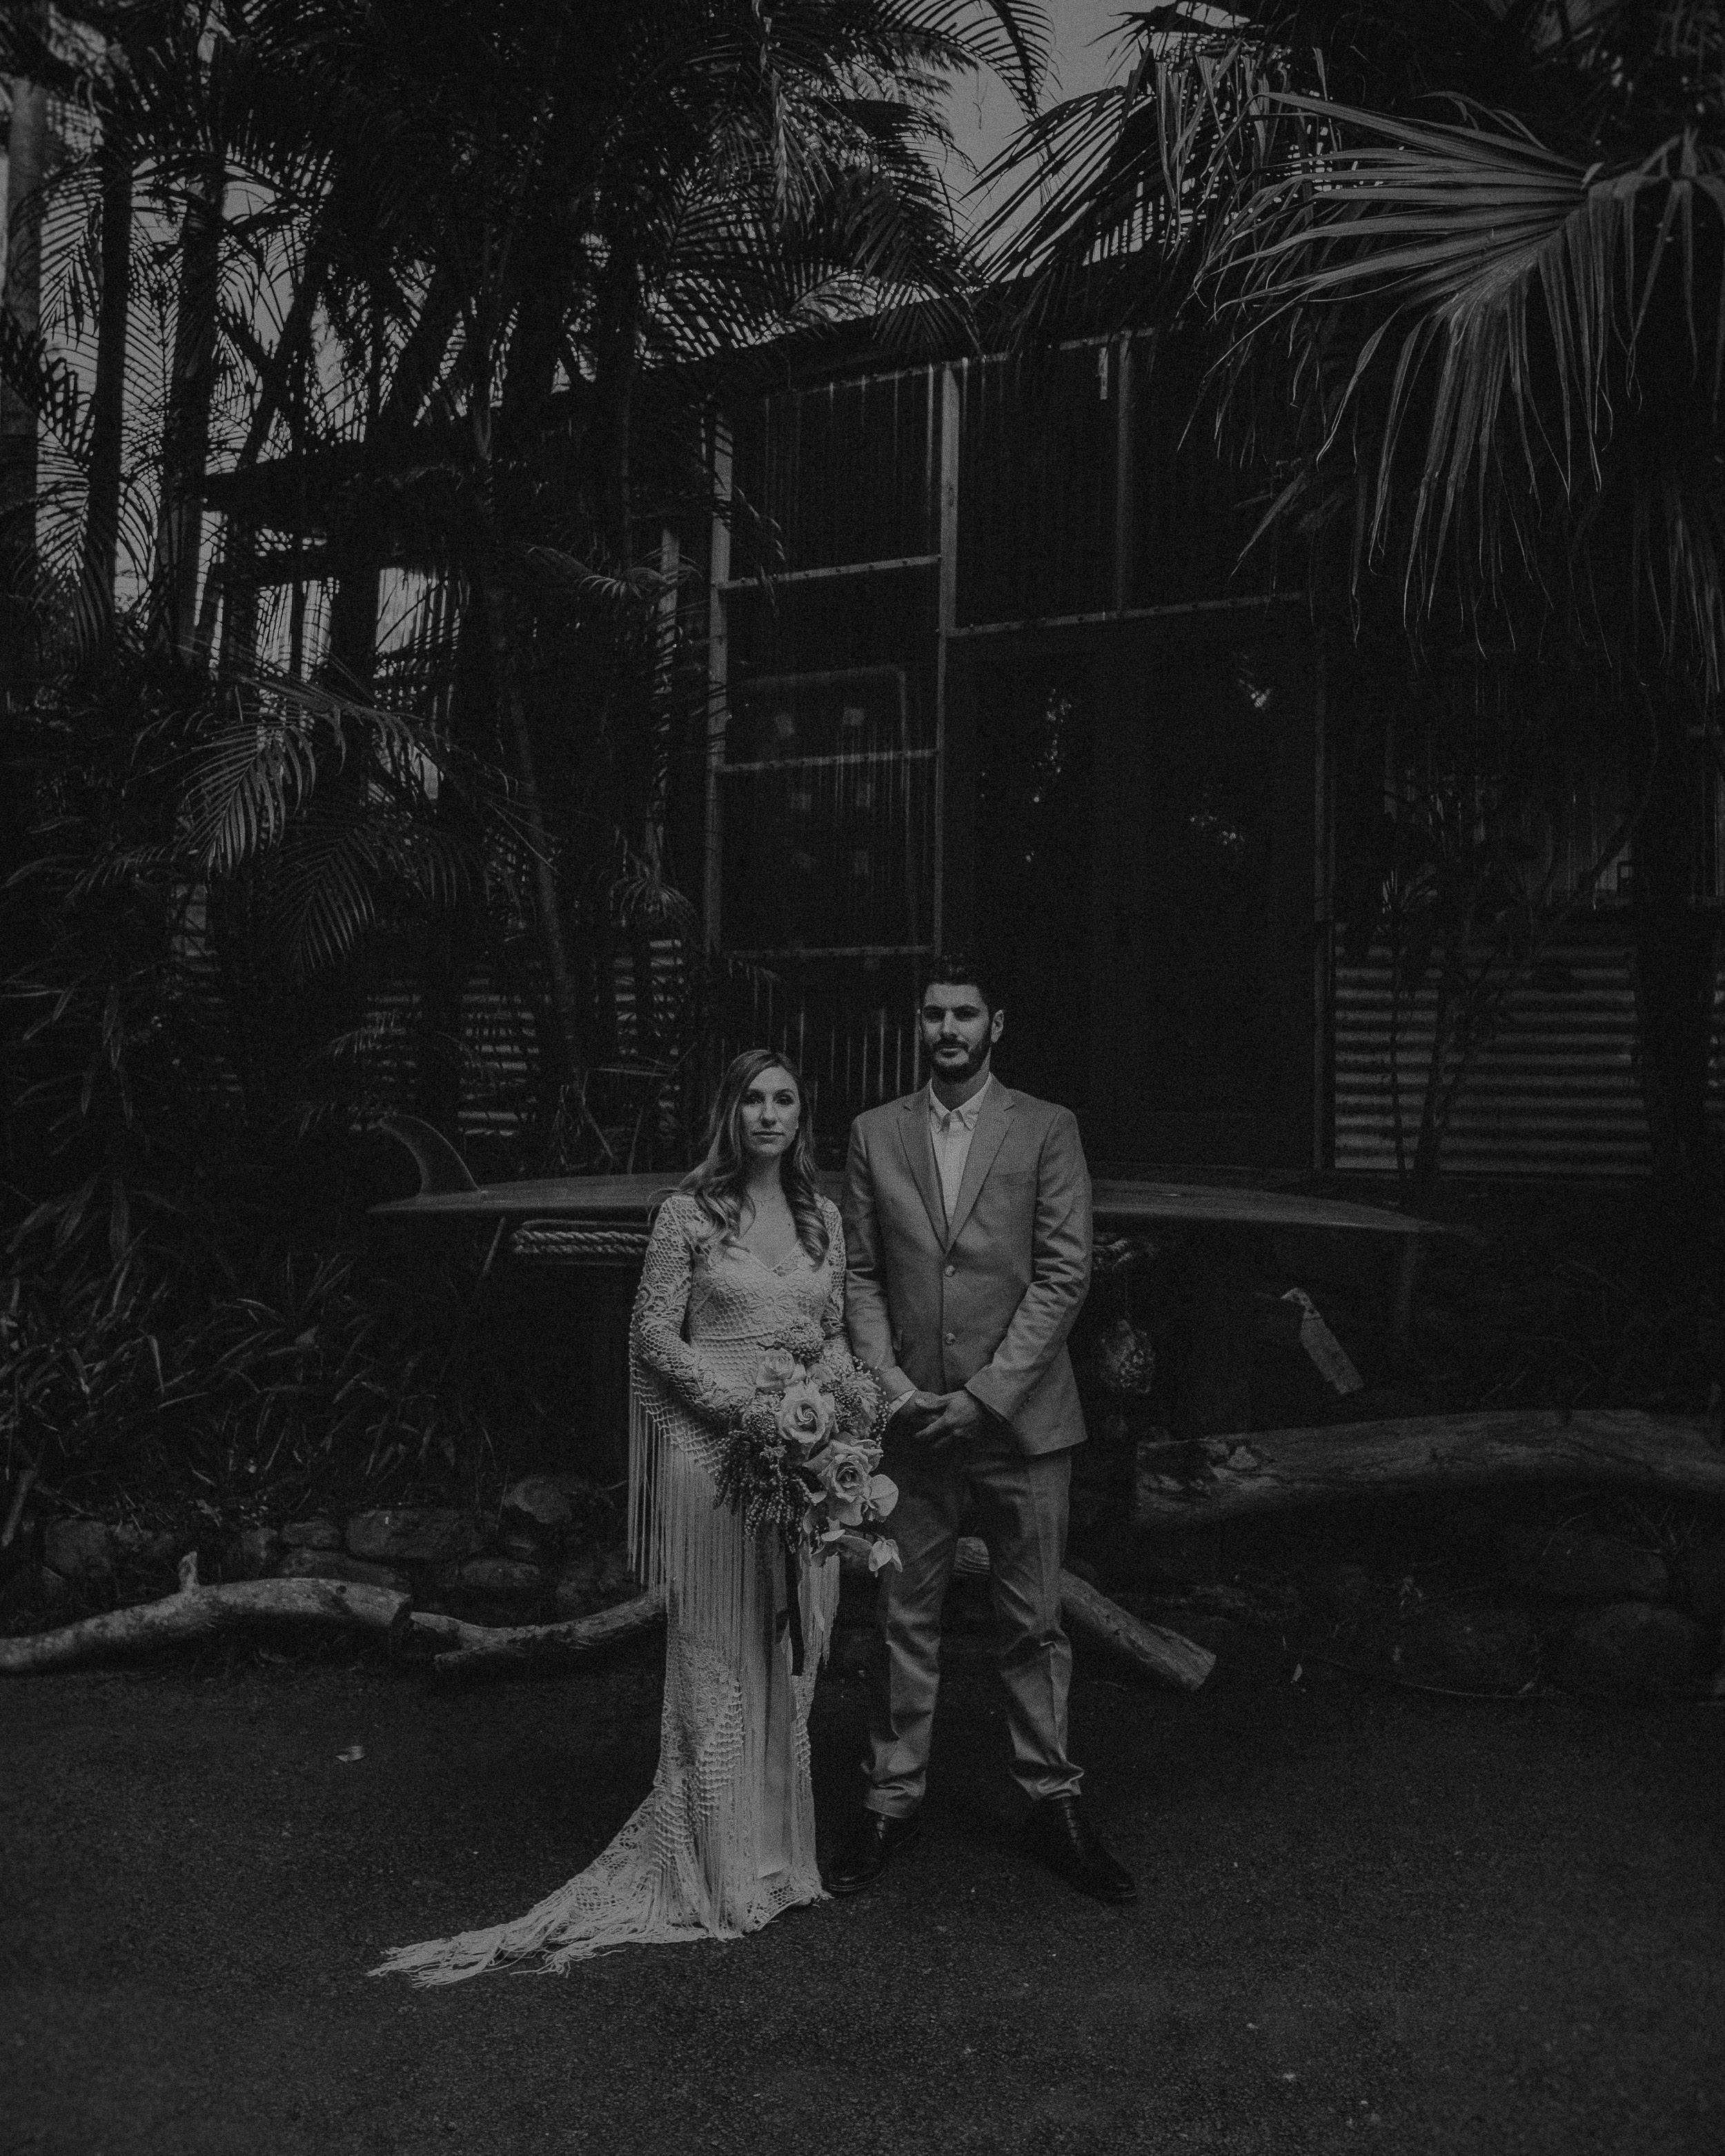 S&A Elopement - Kings & Thieves - Shred 'Til Dead - Central Coast Beach Forest Wedding - 315.jpg